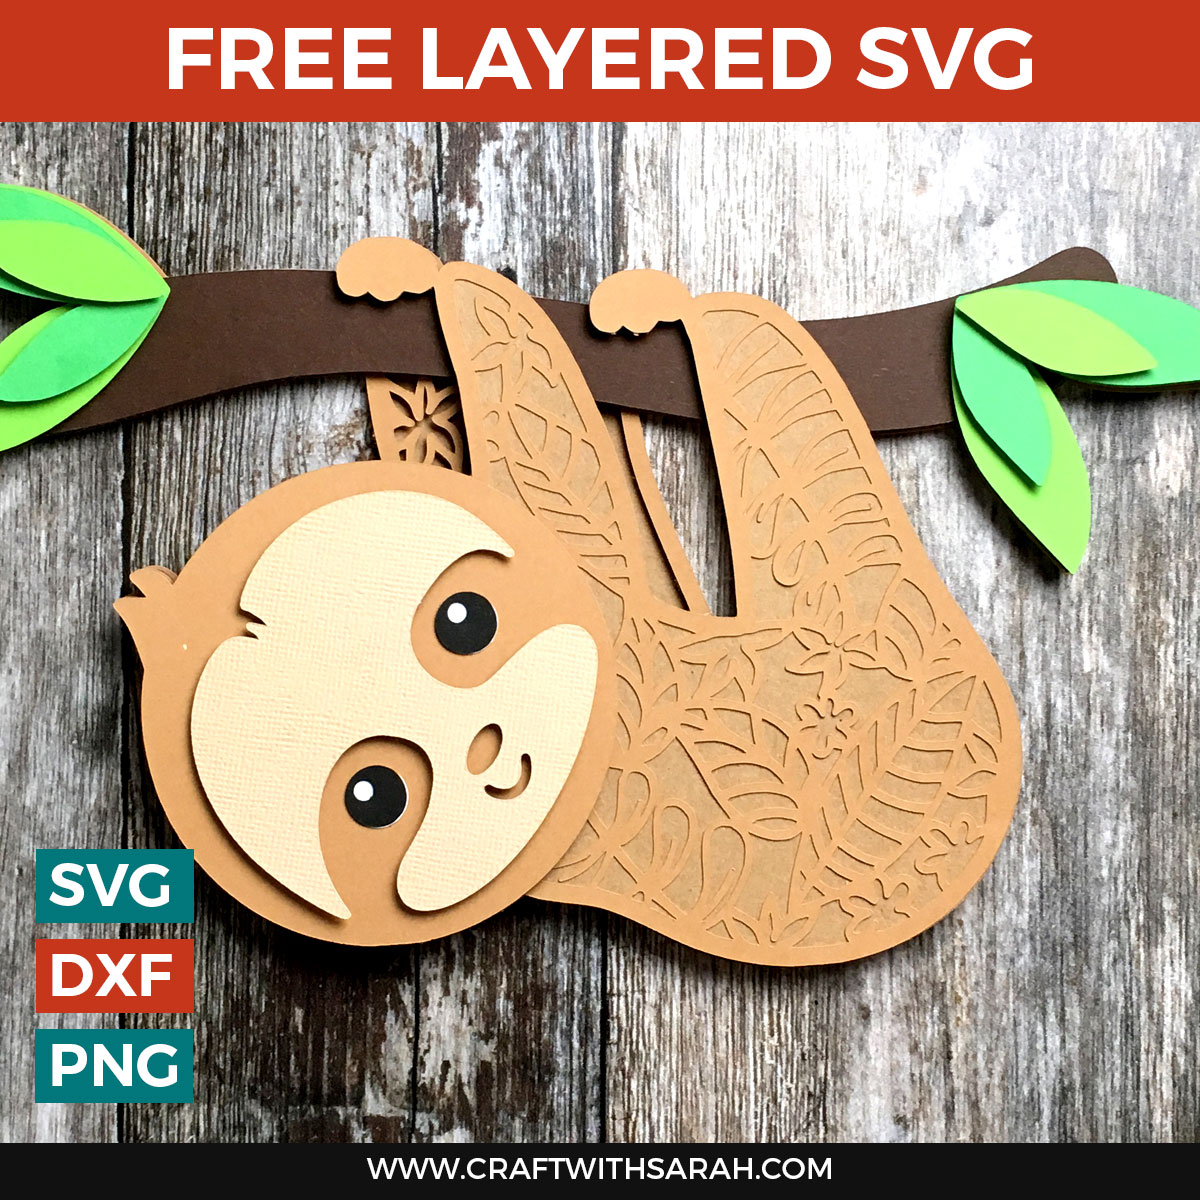 Free Sloth Layered SVG